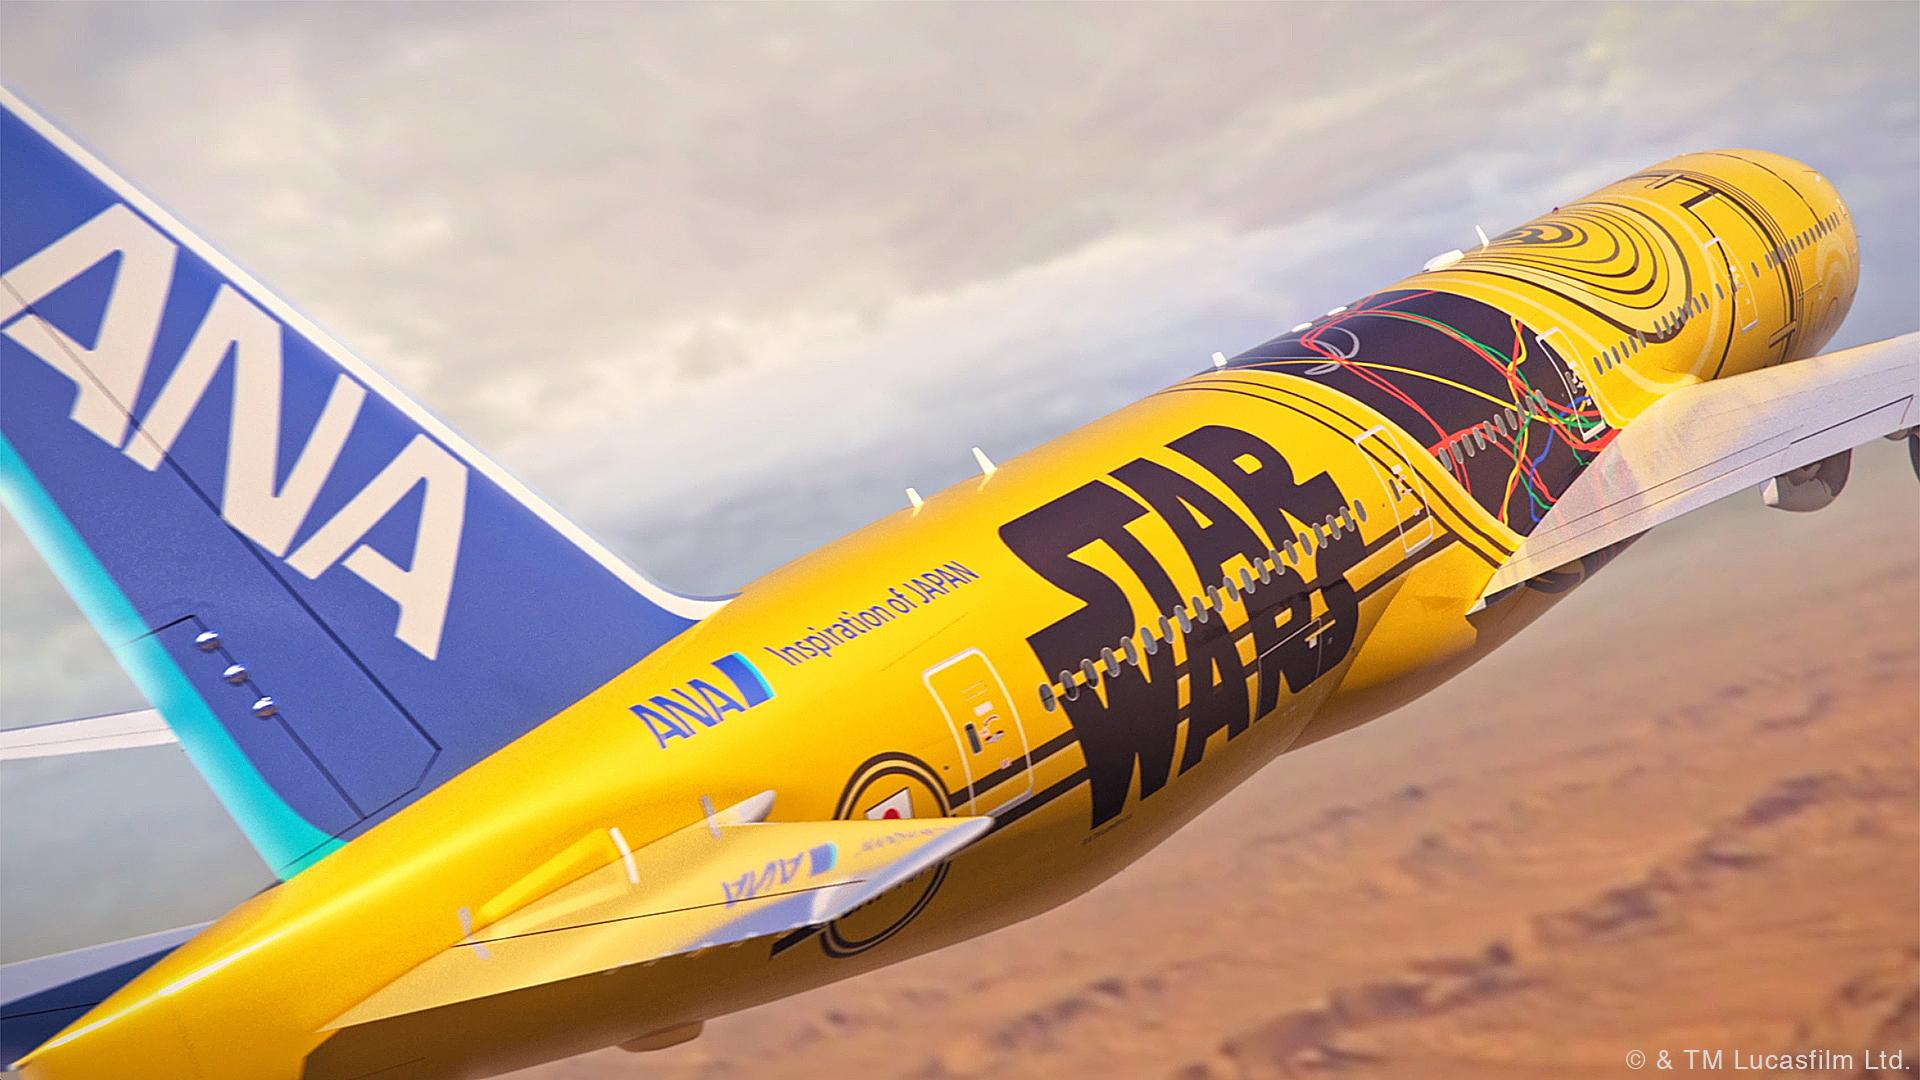 ANA 『C-3PO ANA JET』を新たに発表!国内線にB777-200型機で就航!!